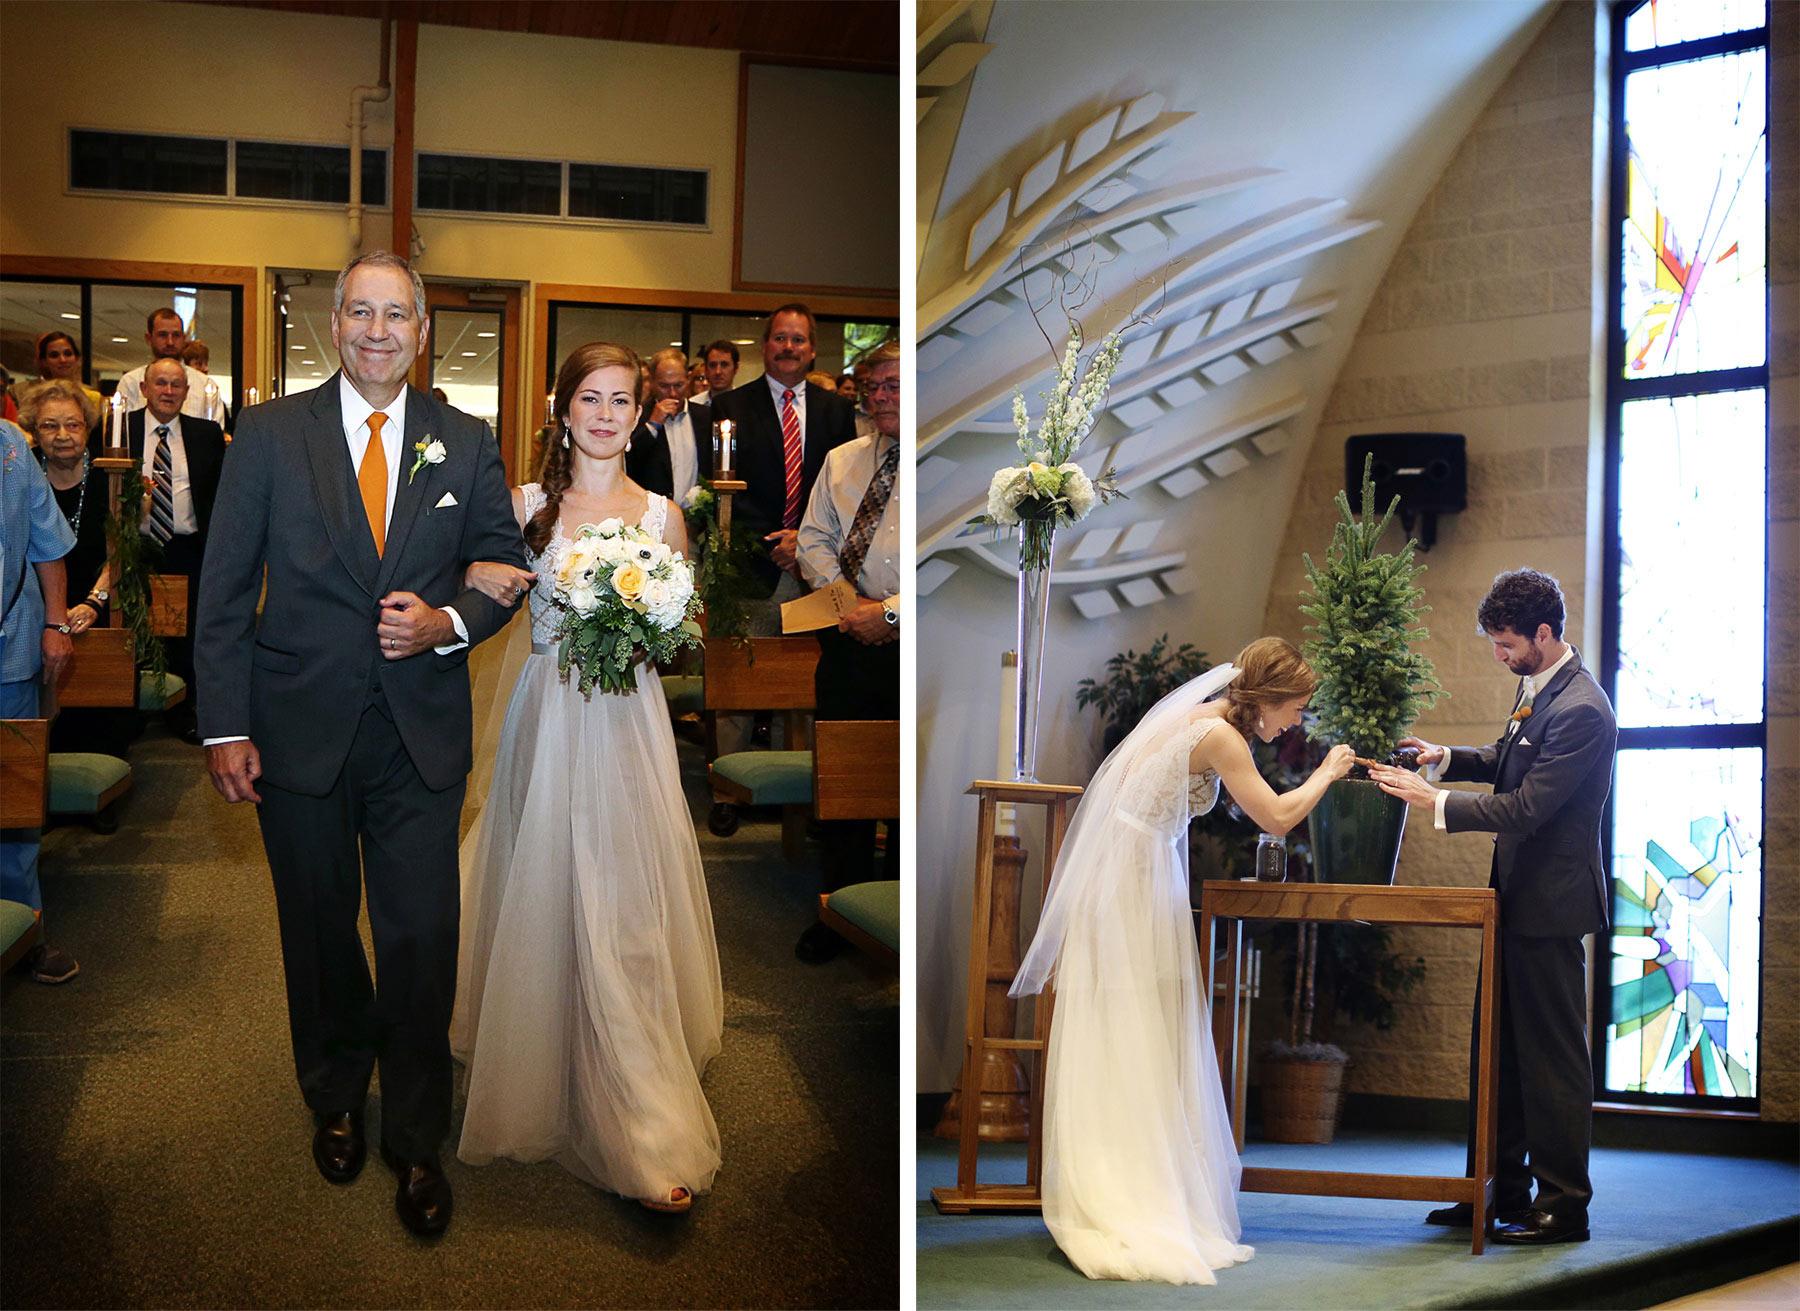 07-Minneapolis-Minnesota-Wedding-Photography-by-Vick-Photography-St-Stephen-Lutheran-Church-Ceremony-Sarah-&-Tom.jpg